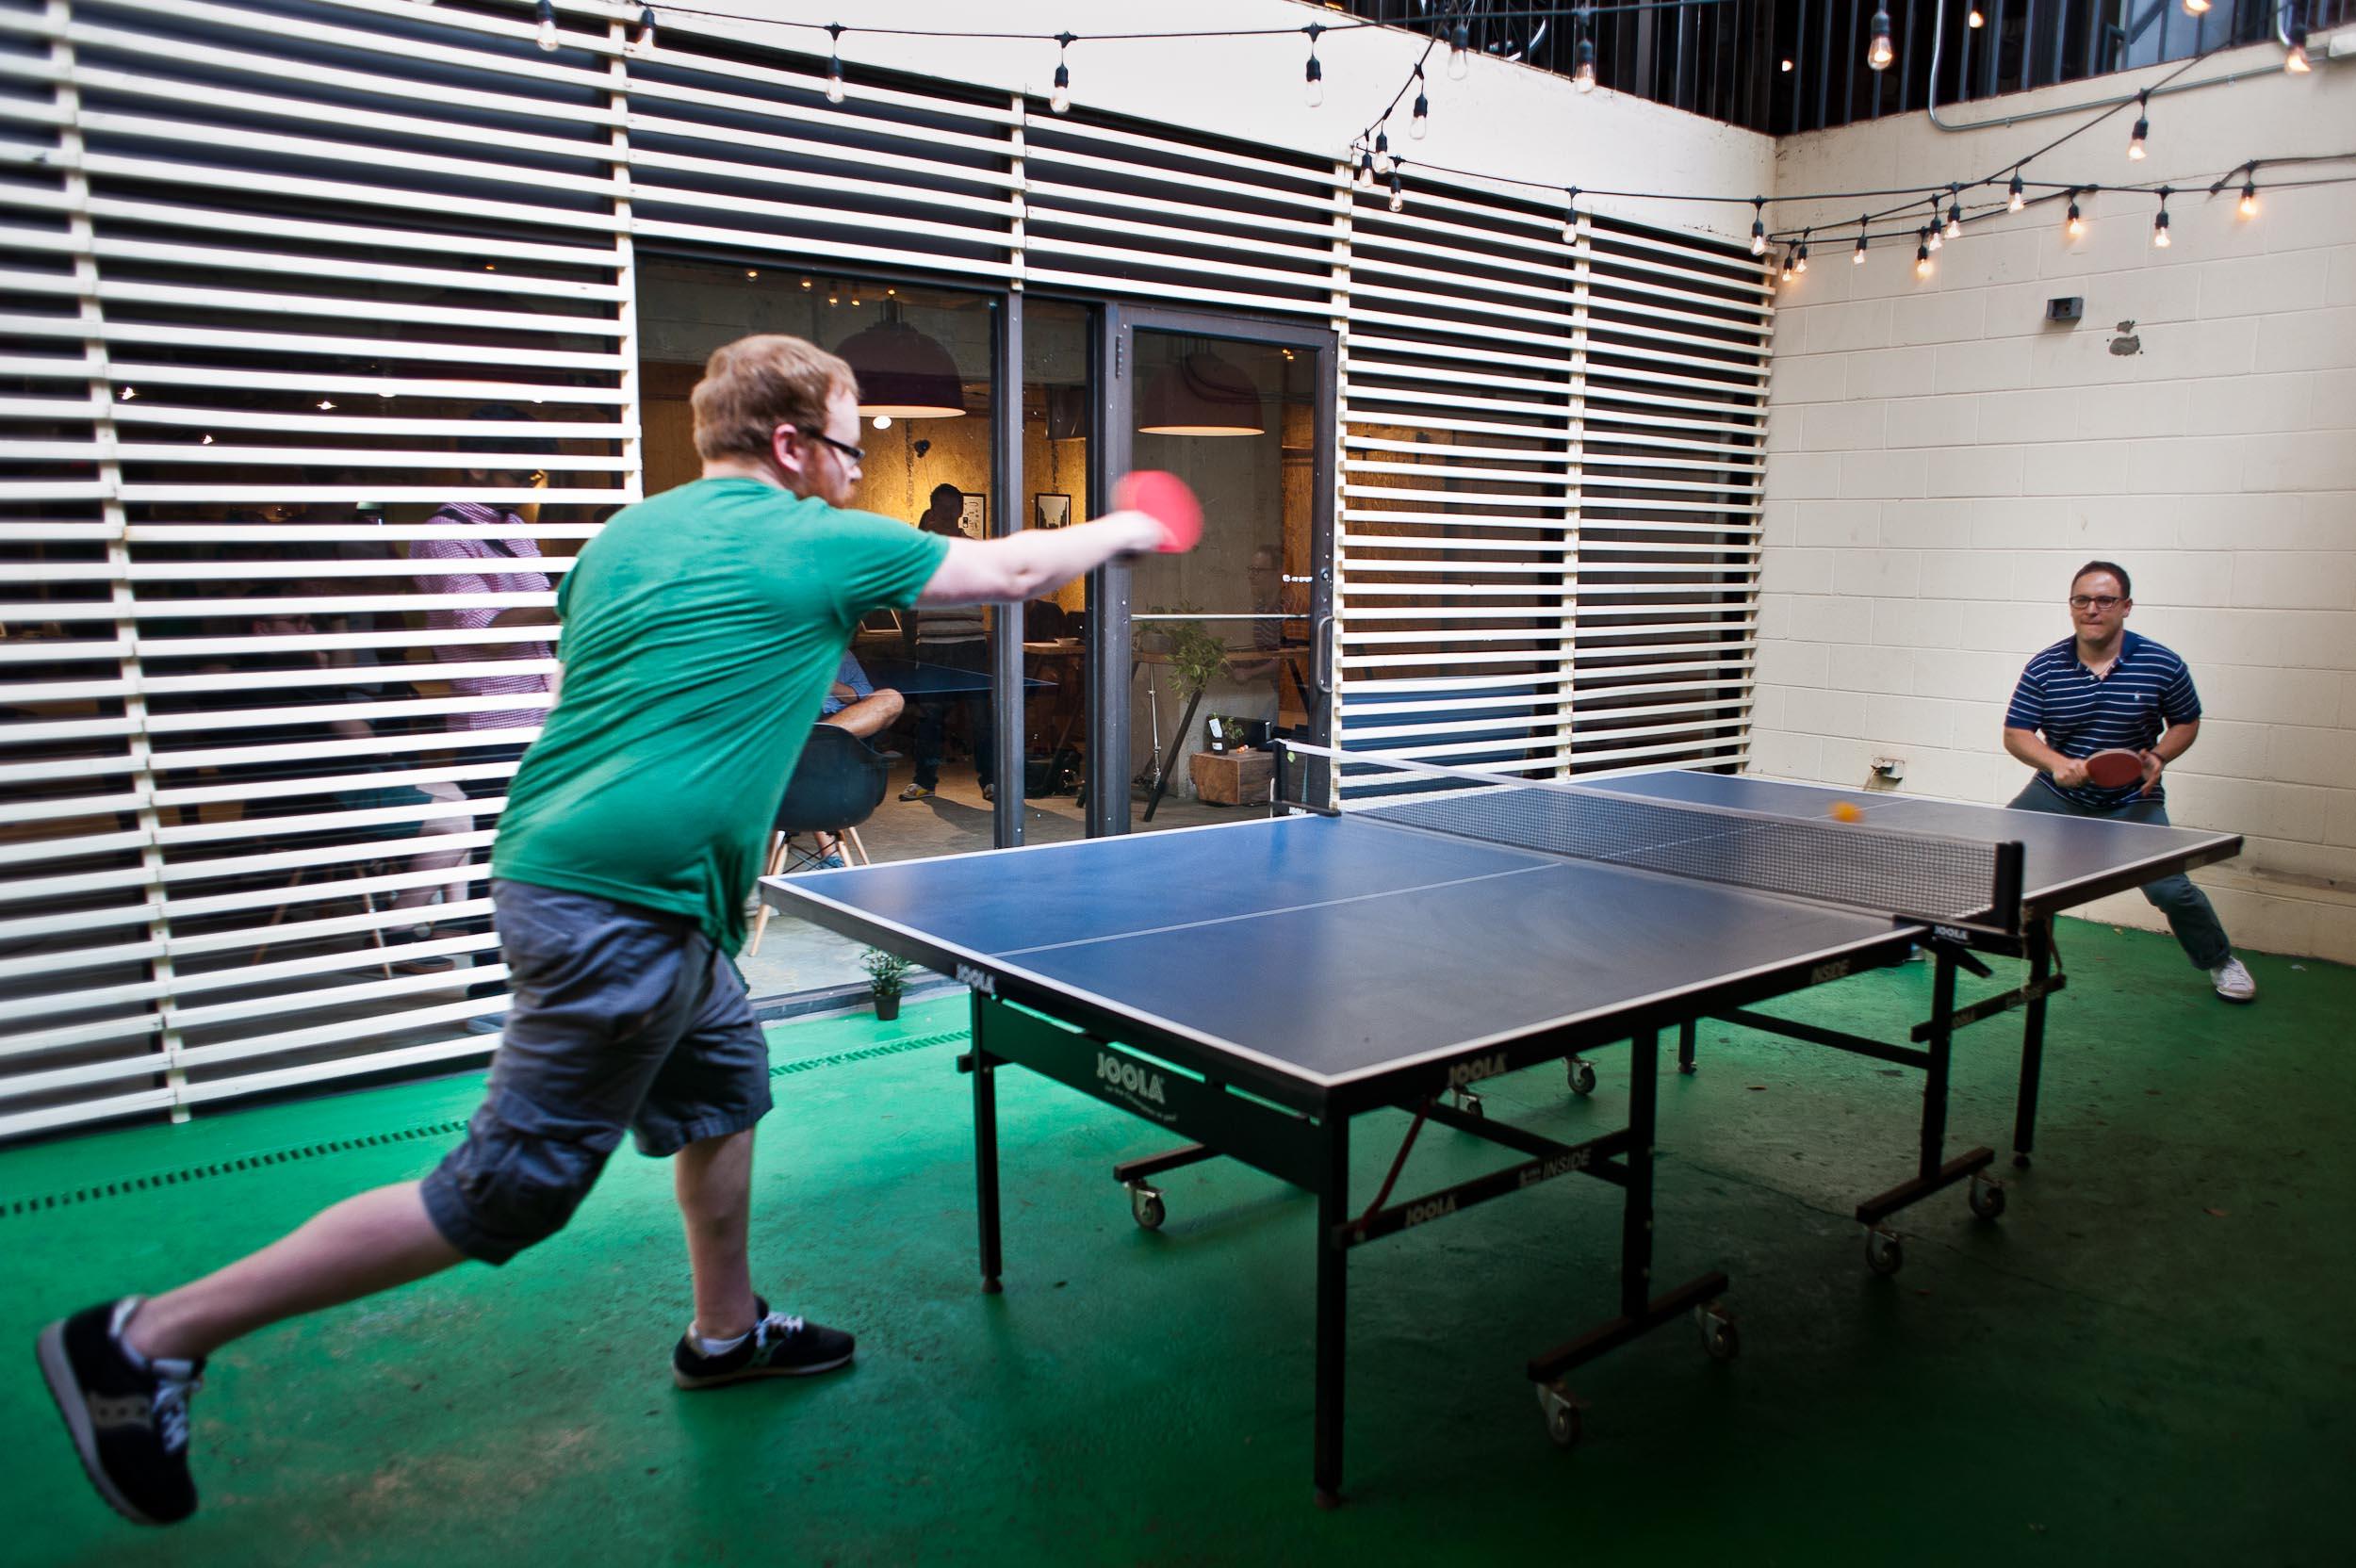 SDC Ping Pong Tournament 1.0 (Web Ready)_005.JPG